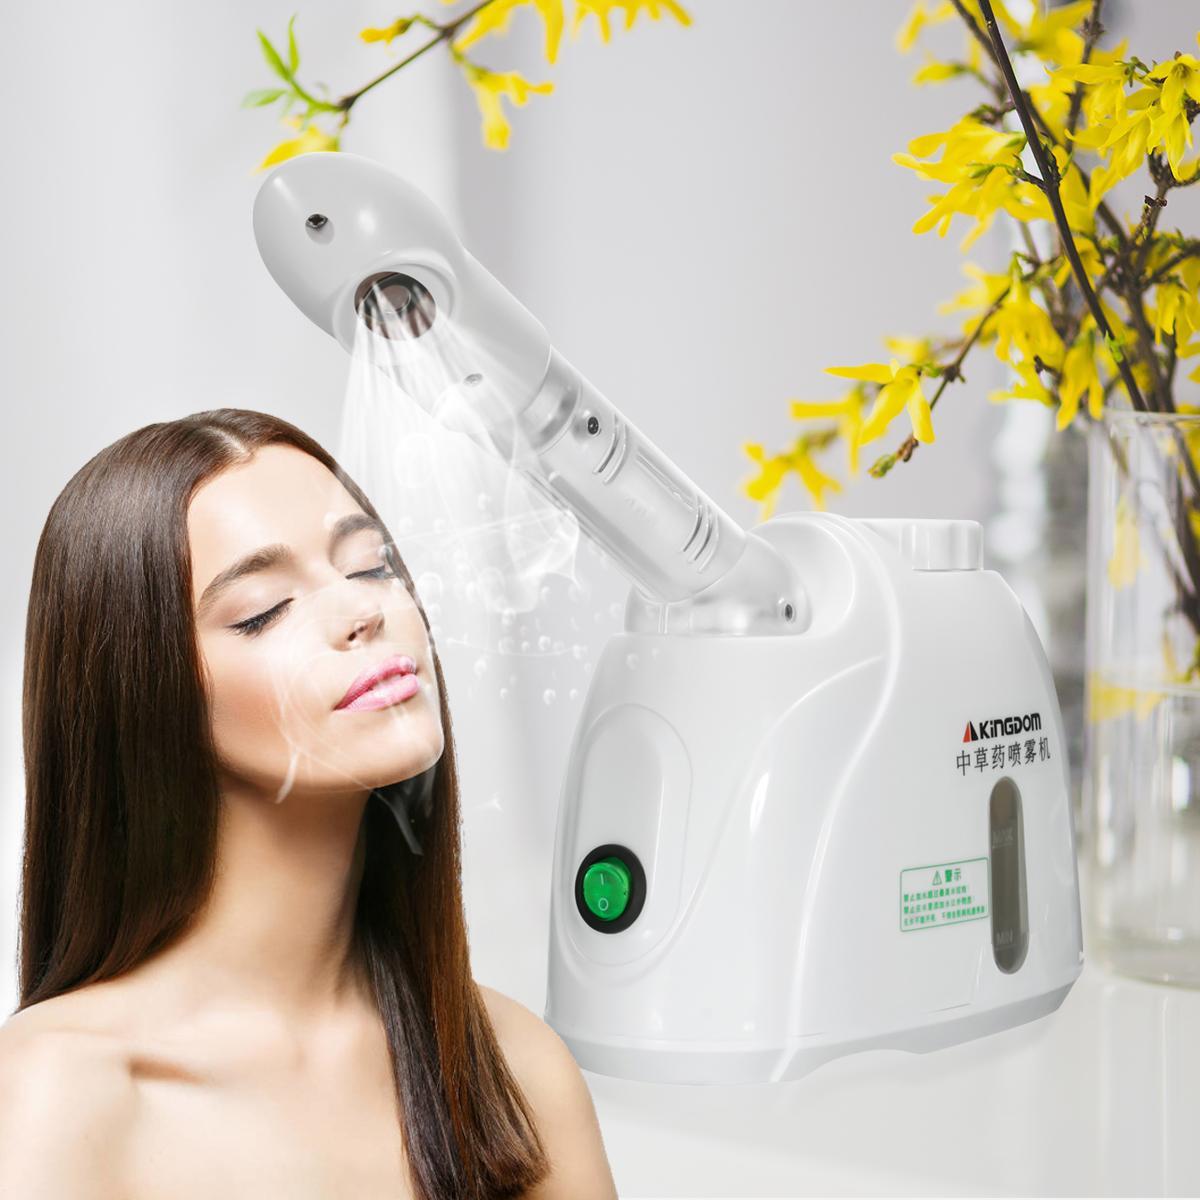 Profesional Ozon Alat Penguap Wajah Wajah Sprayer Salon Kecantikan Perawatan Kulit Instrumen-Intl